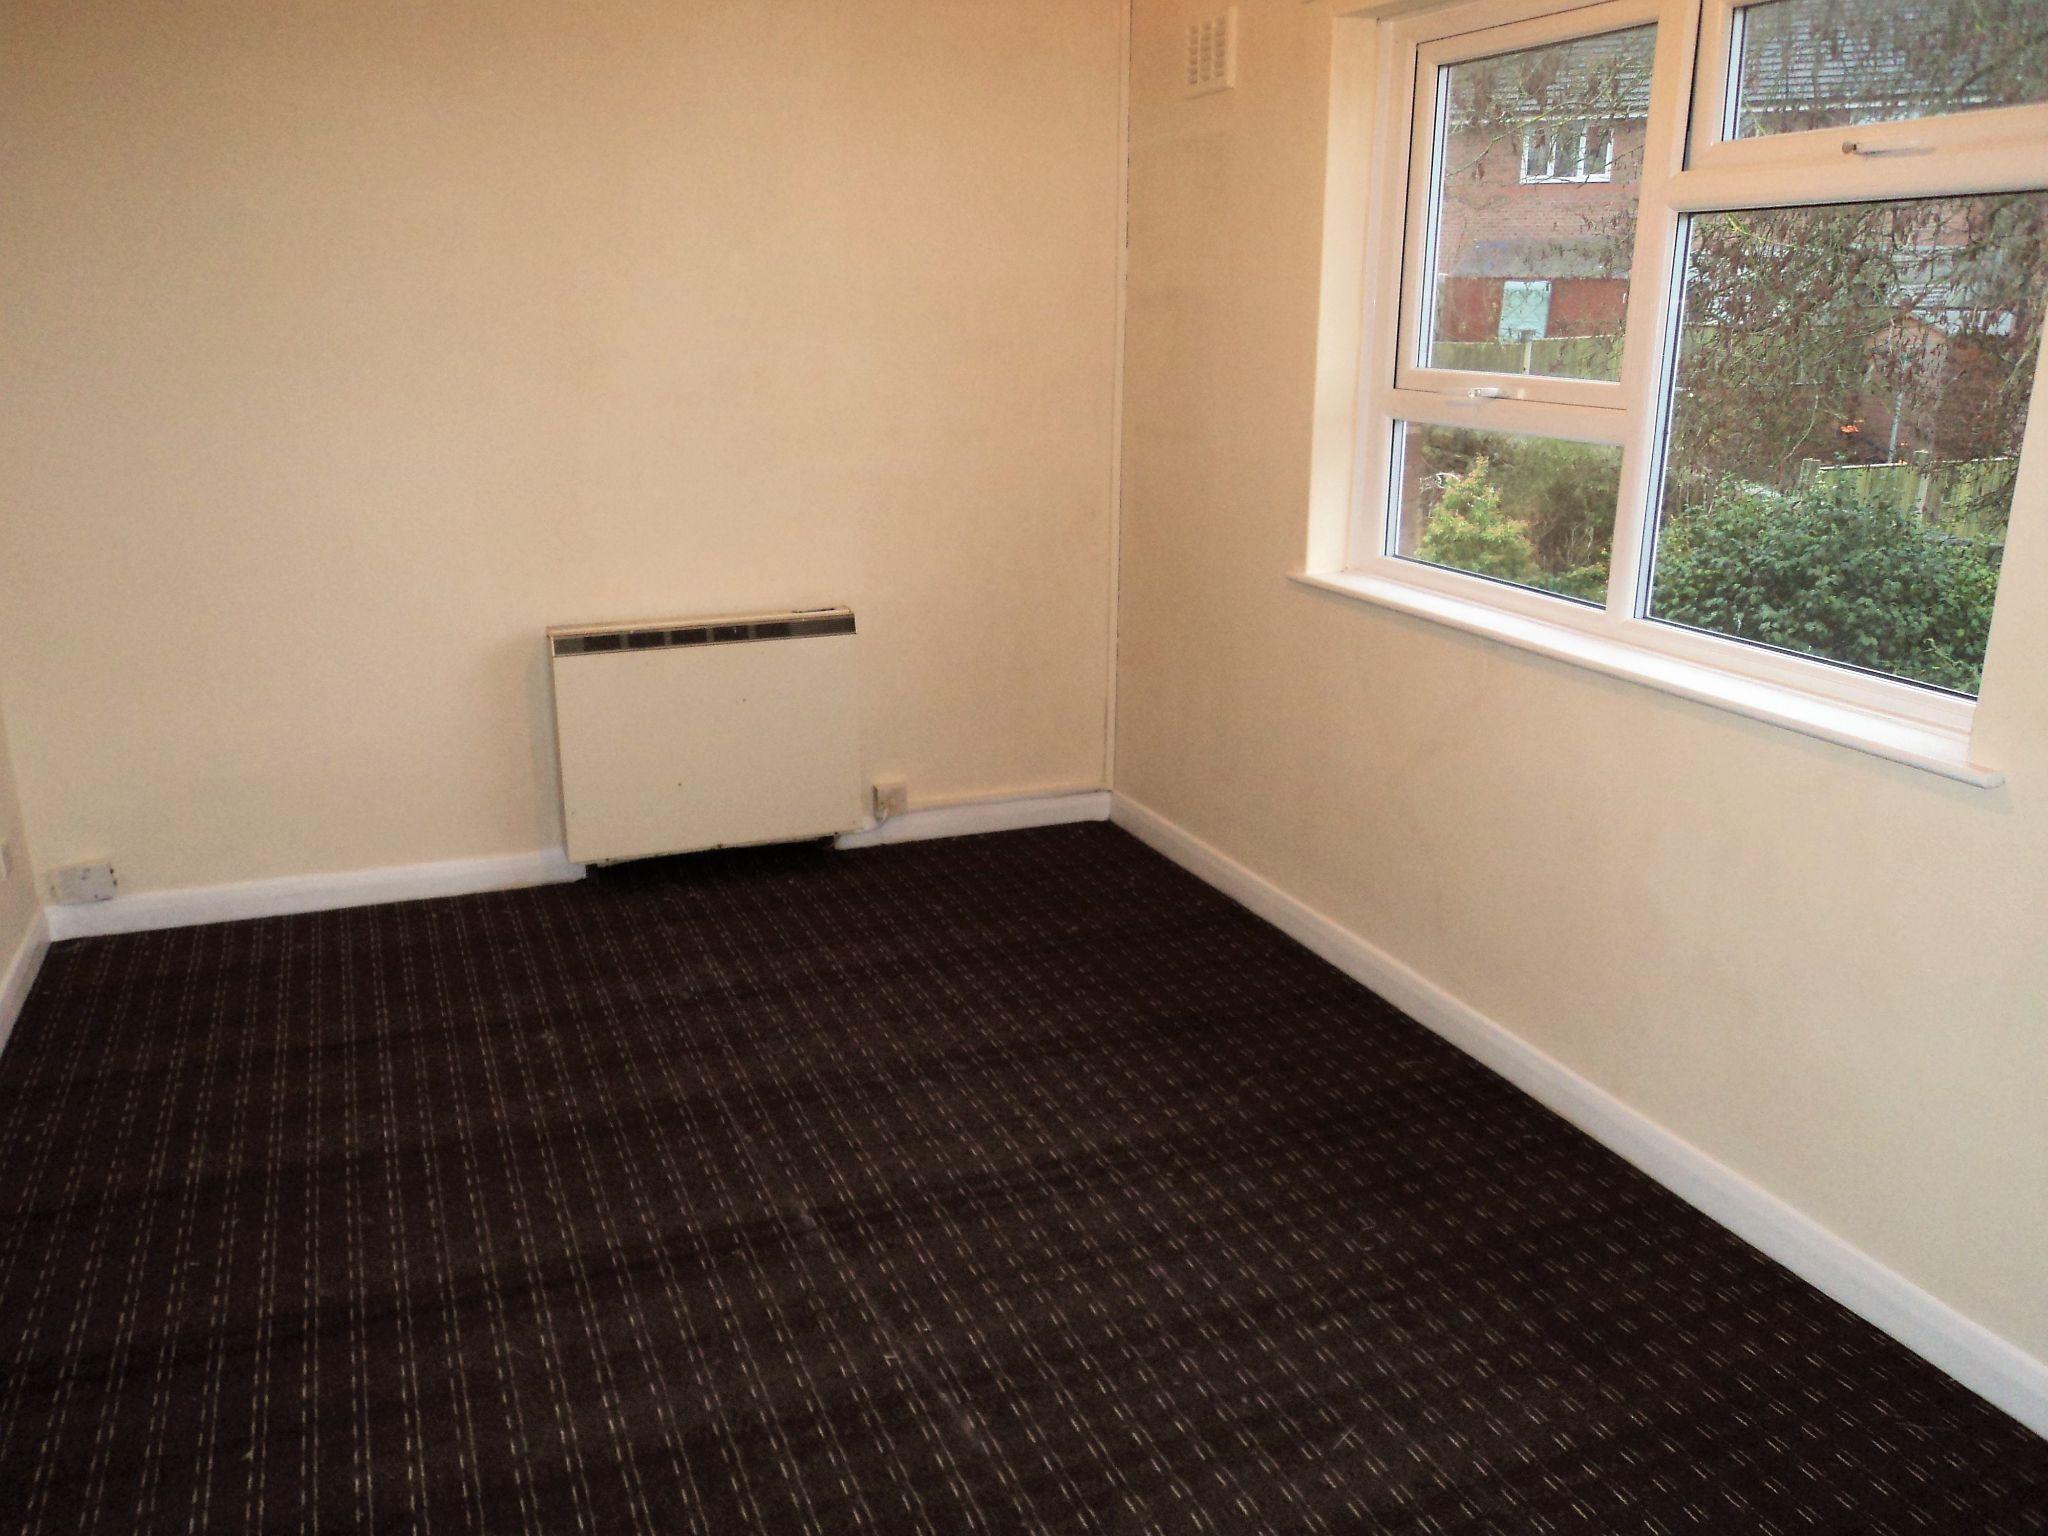 1 Bedroom Flat Flat/apartment To Rent - Photograph 3